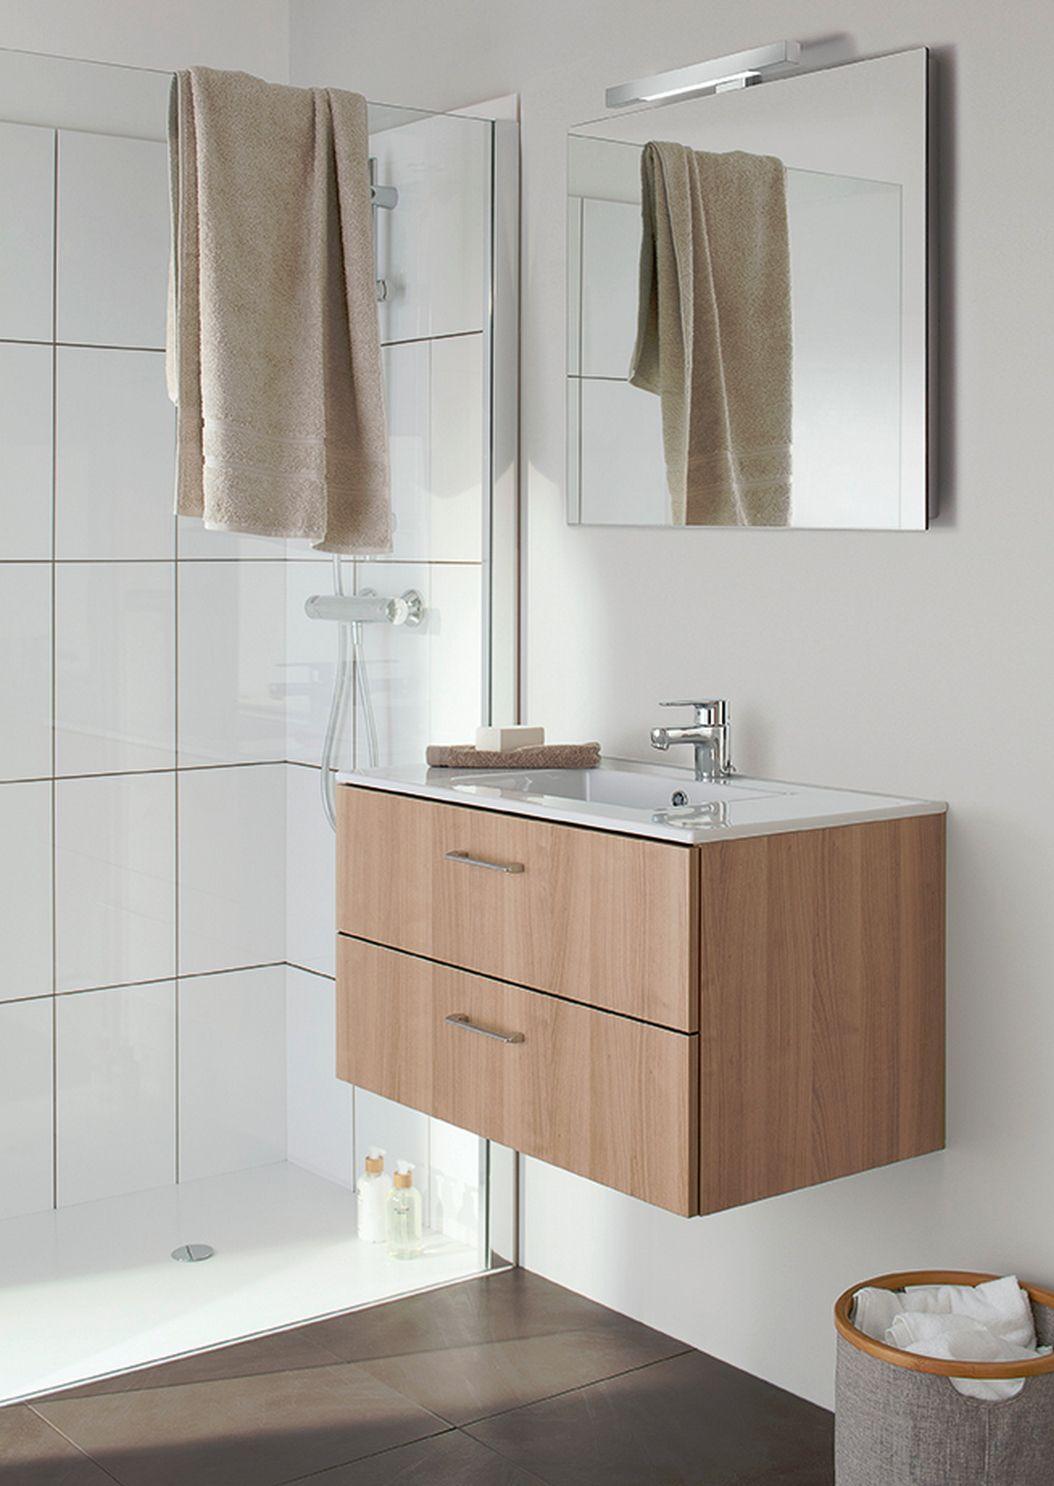 Meuble Salle De Bain Sanijura Xs ~ meuble salle de bain vasque bois merisier sanijura http www deco